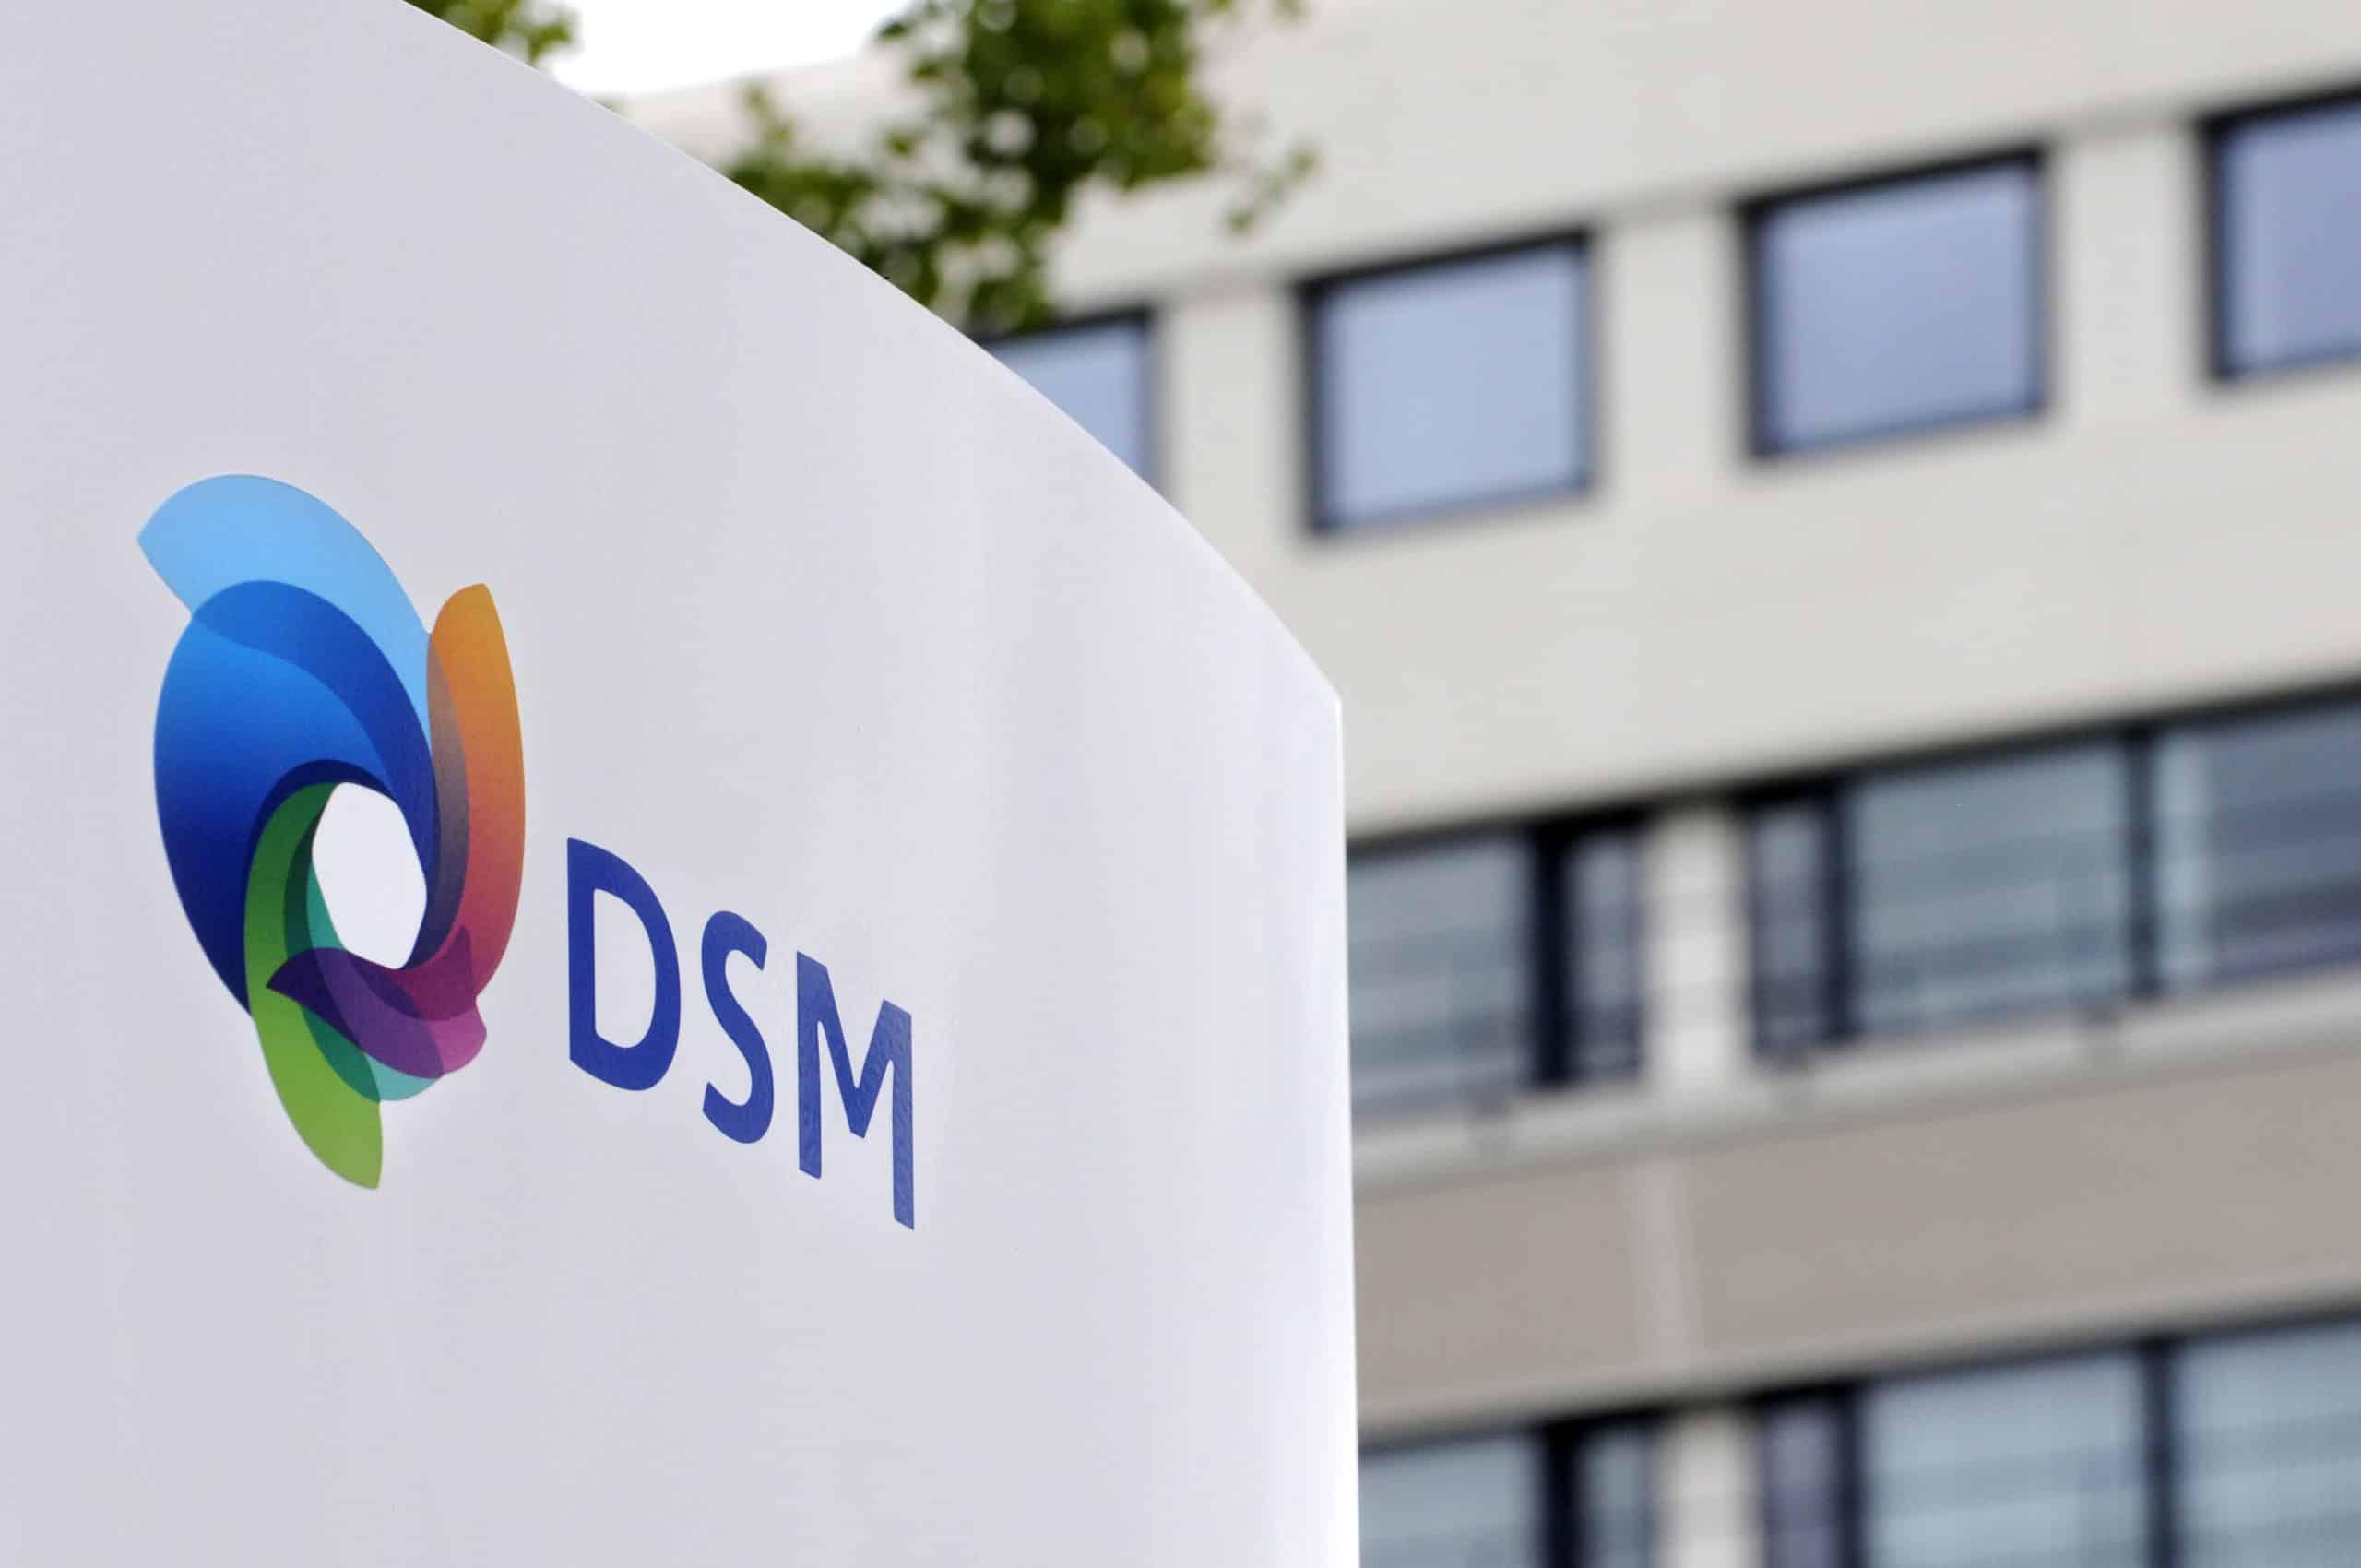 Dsm Keukens Betaling : Zelfstandig Professionals HeadFirst nl